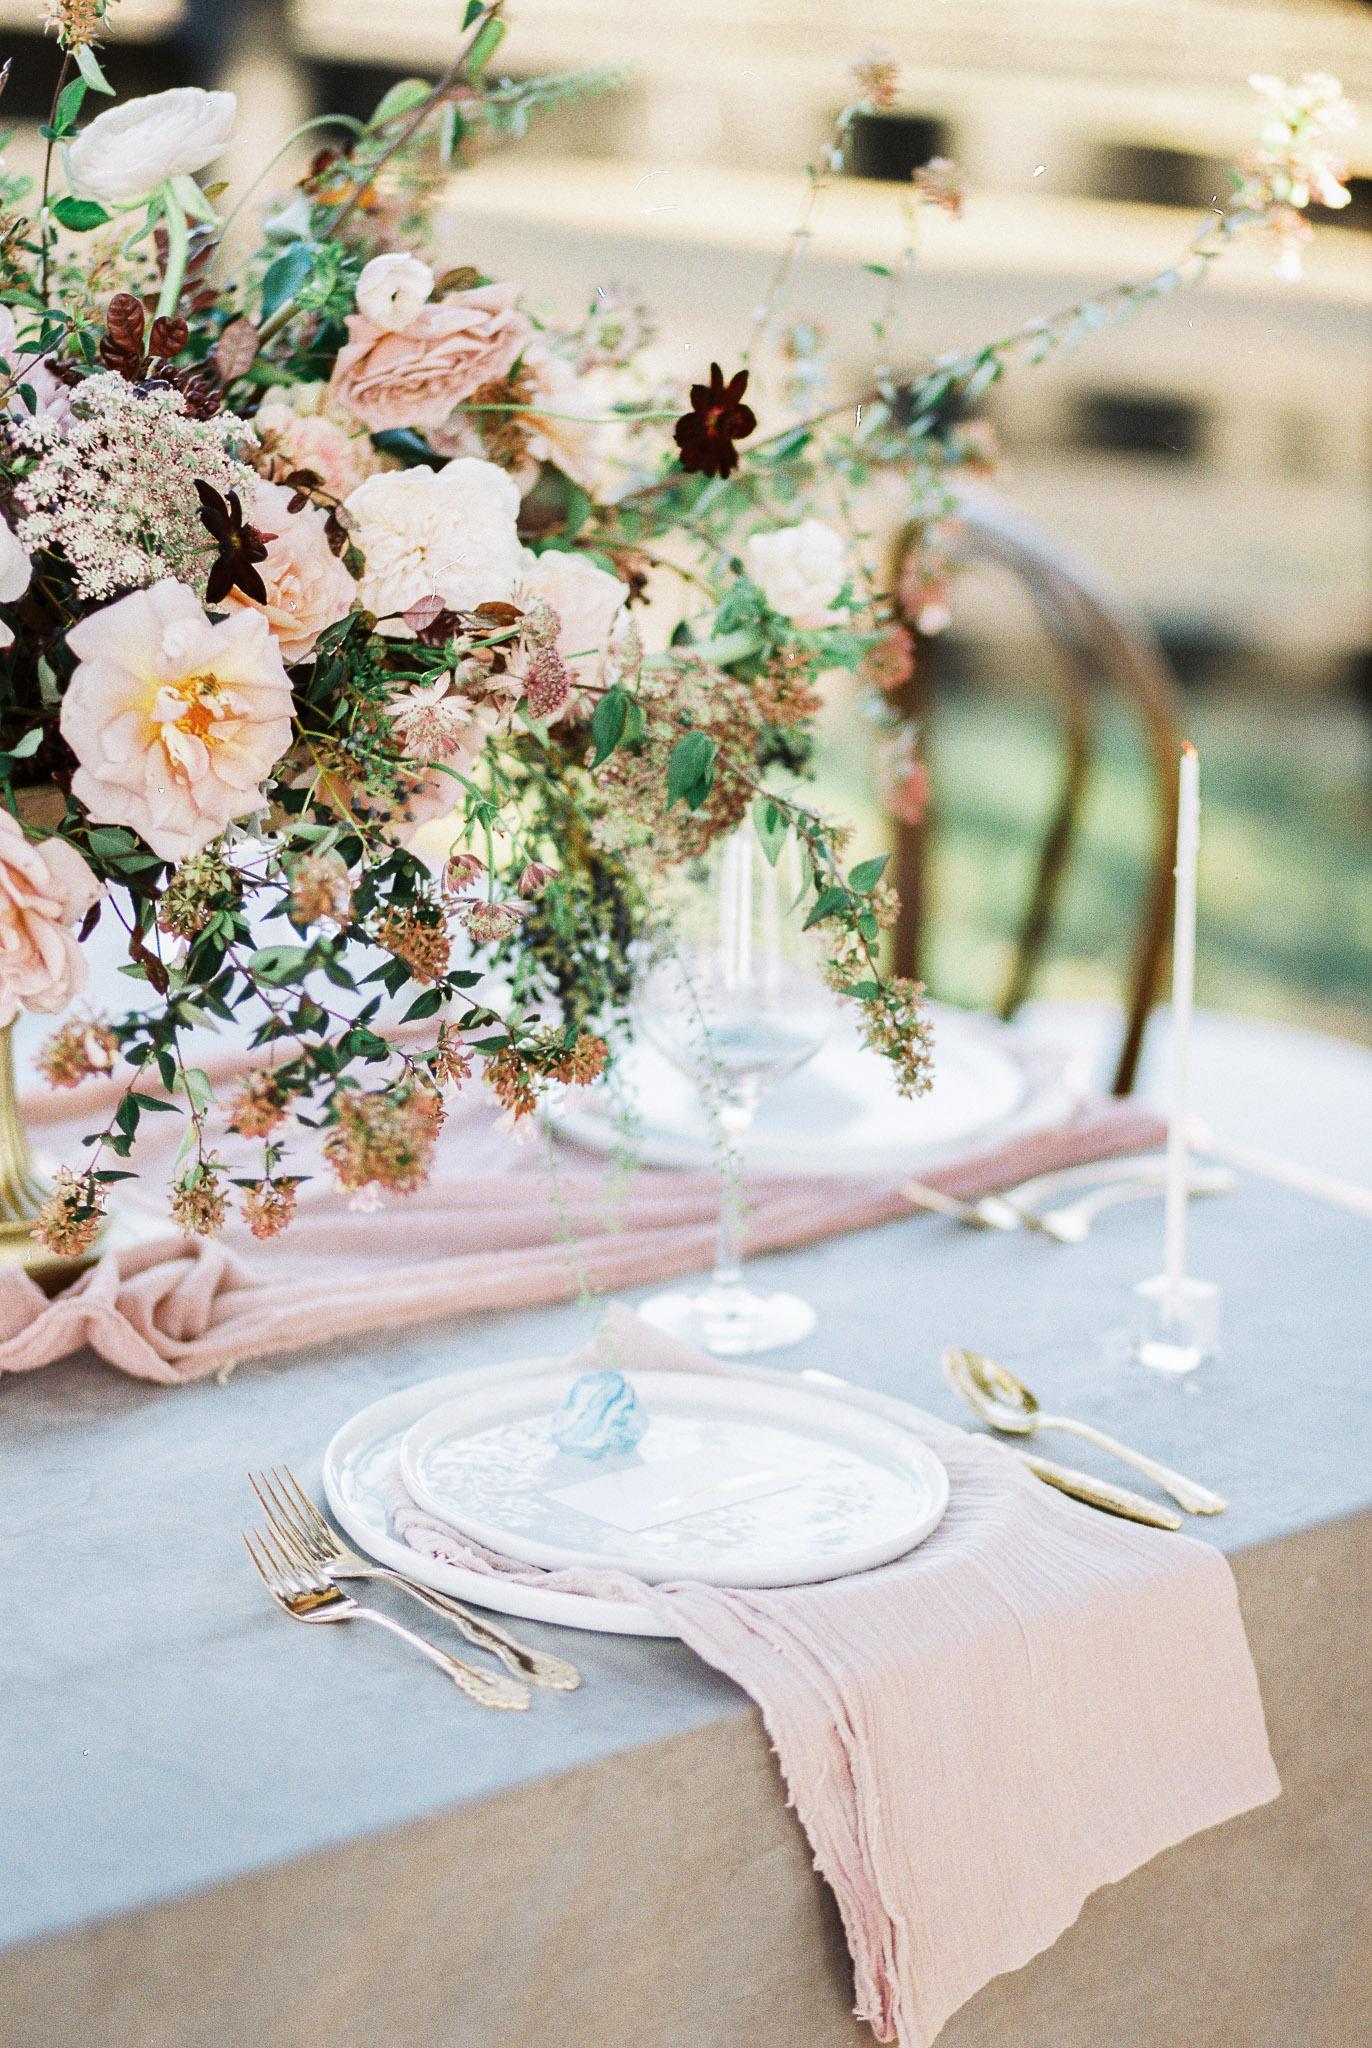 pop-the-cork-wedding-planner-place-setting